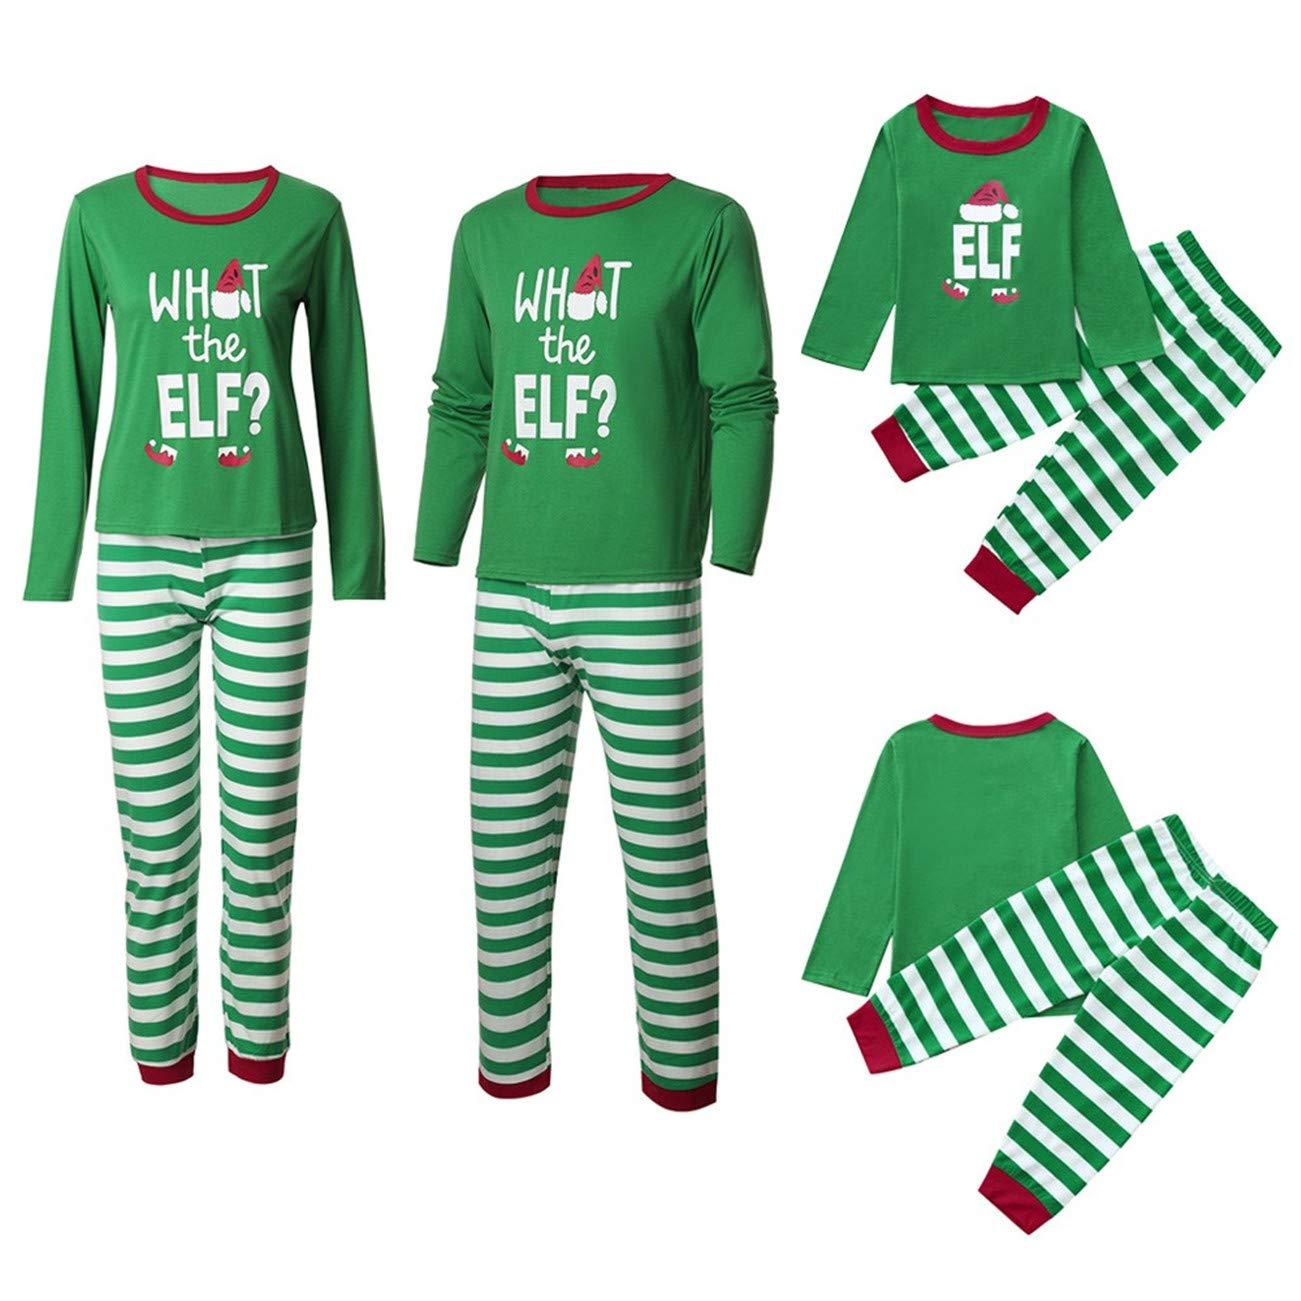 LOVELYOU Famiglia Pigiami di Natale Costume Pigiama Bambina Natale Maniche Lunghe Pigiama Donna Ragazze Due Pezzi Pigiama Uomo Invernali Stampa A Strisce di Lettere Top + Pantaloni LOVEIYOU1314